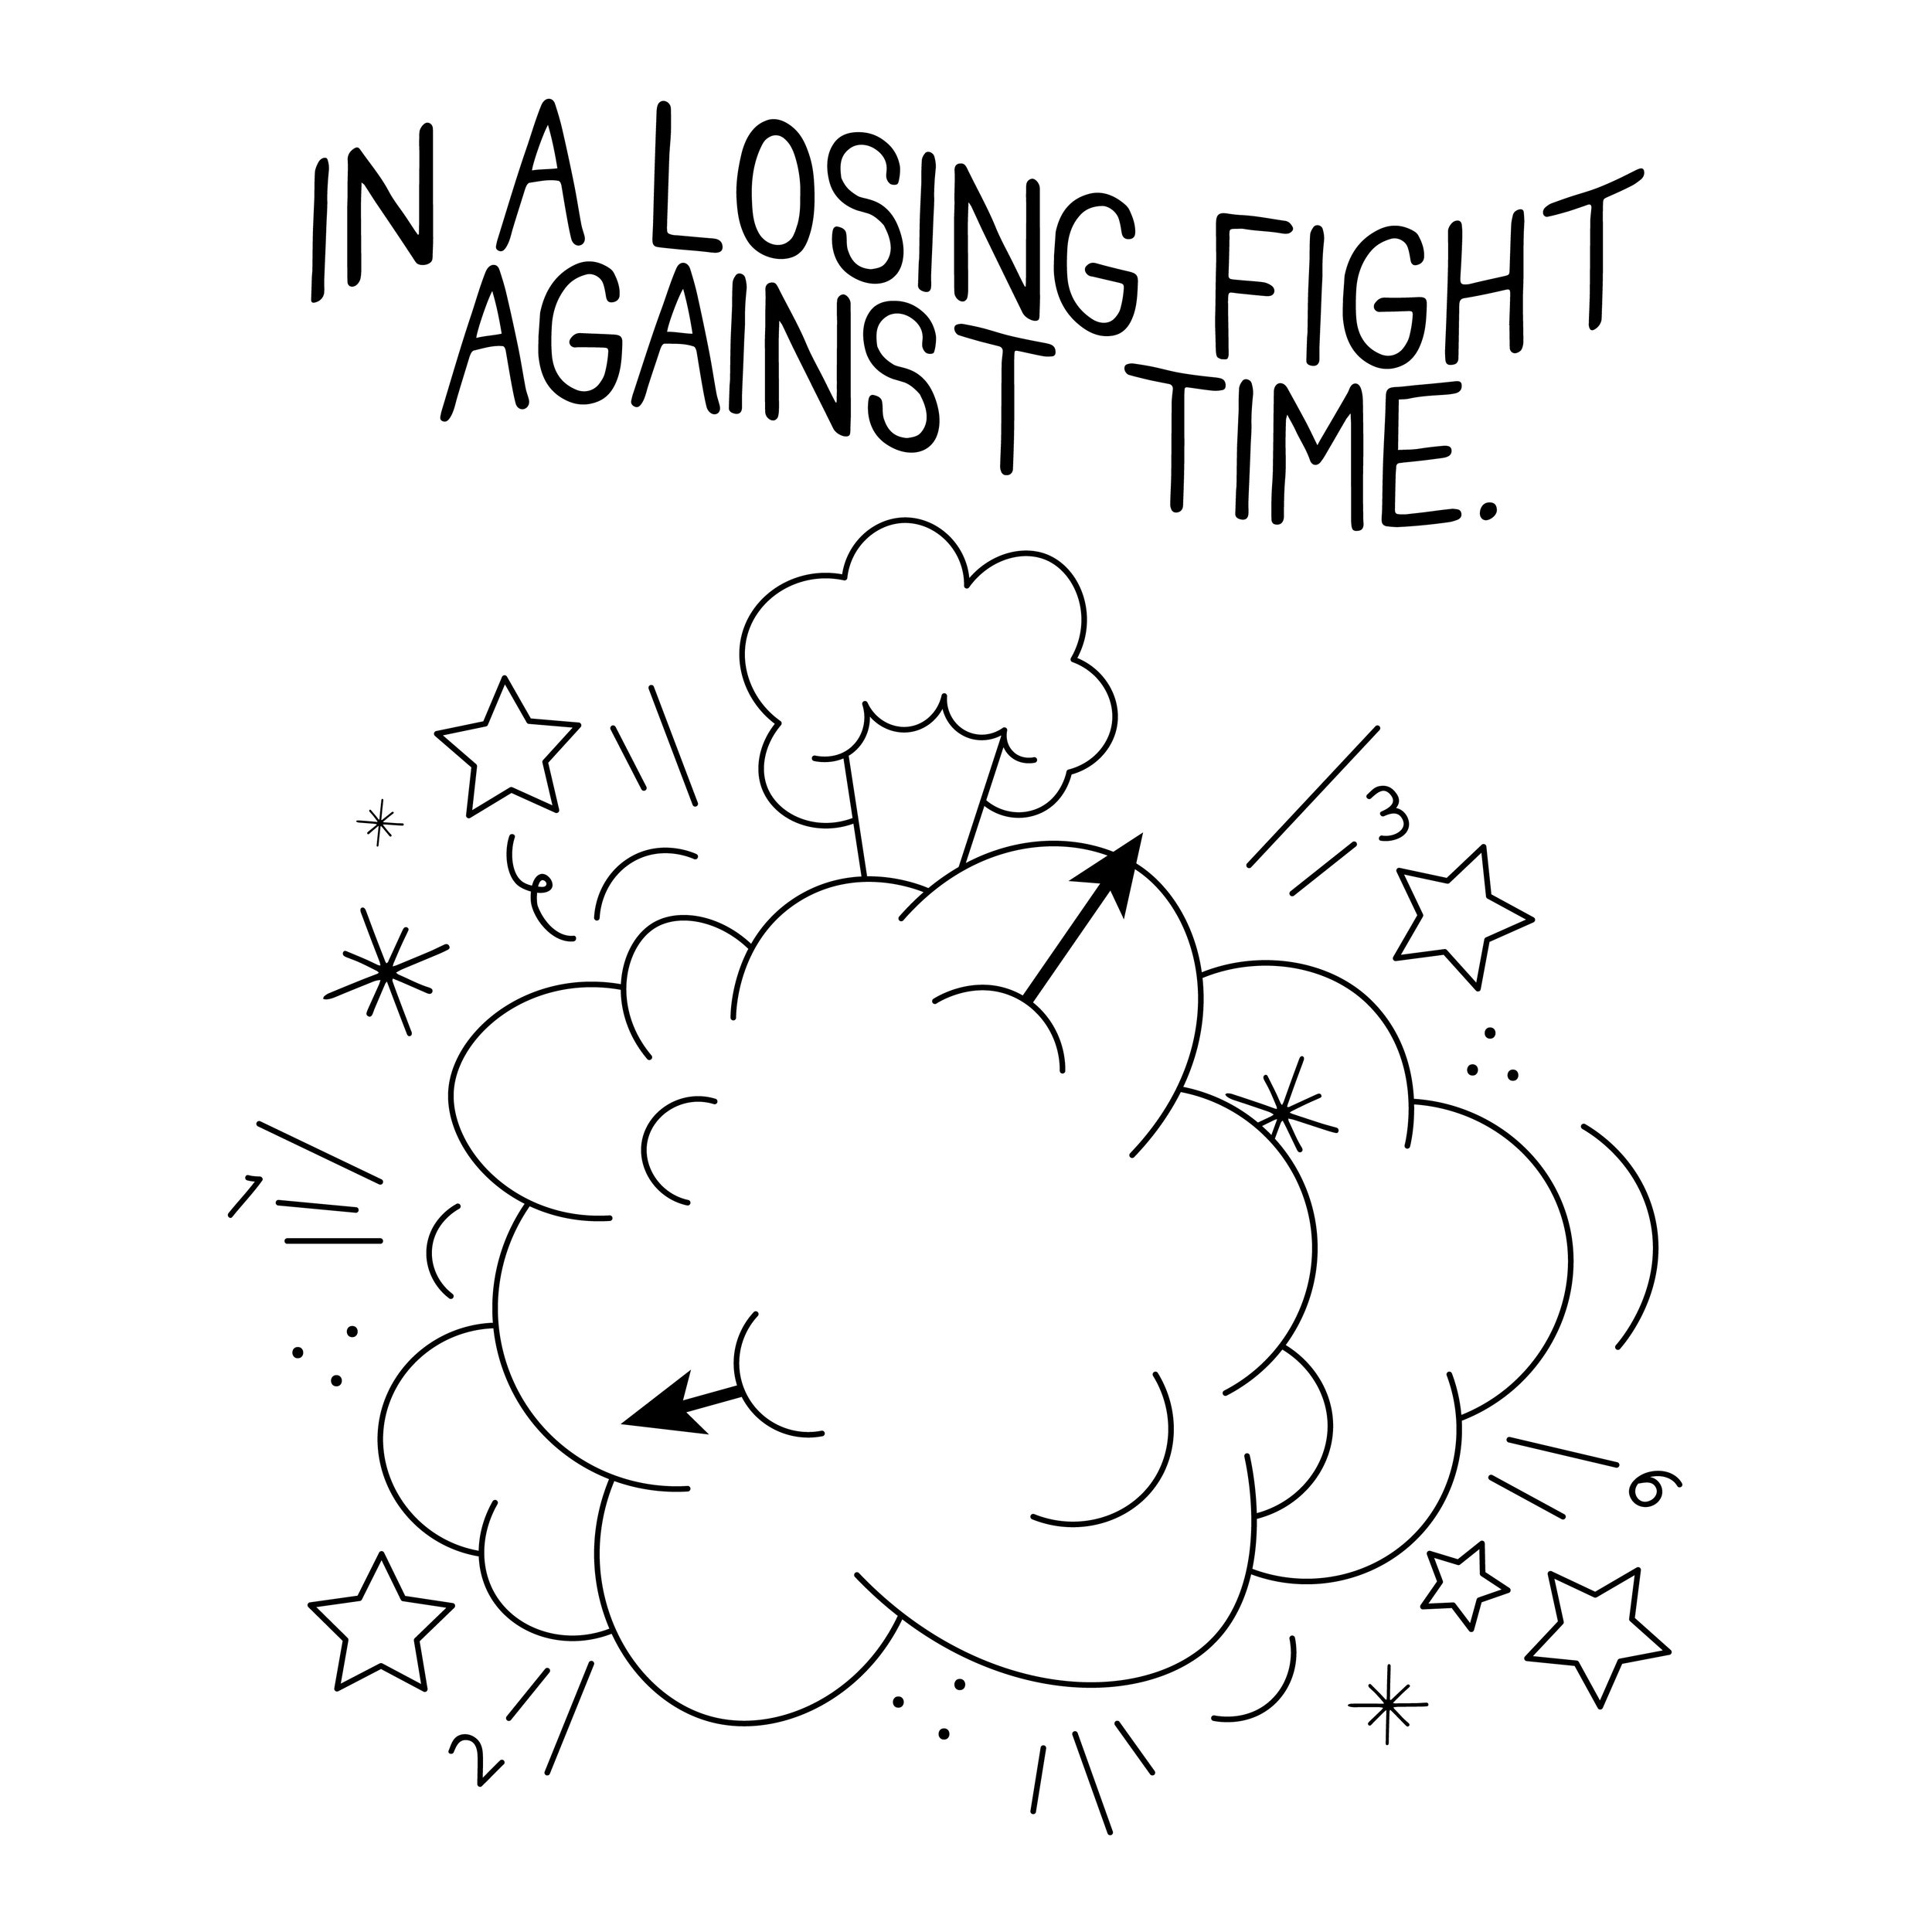 losingfight-01.jpg